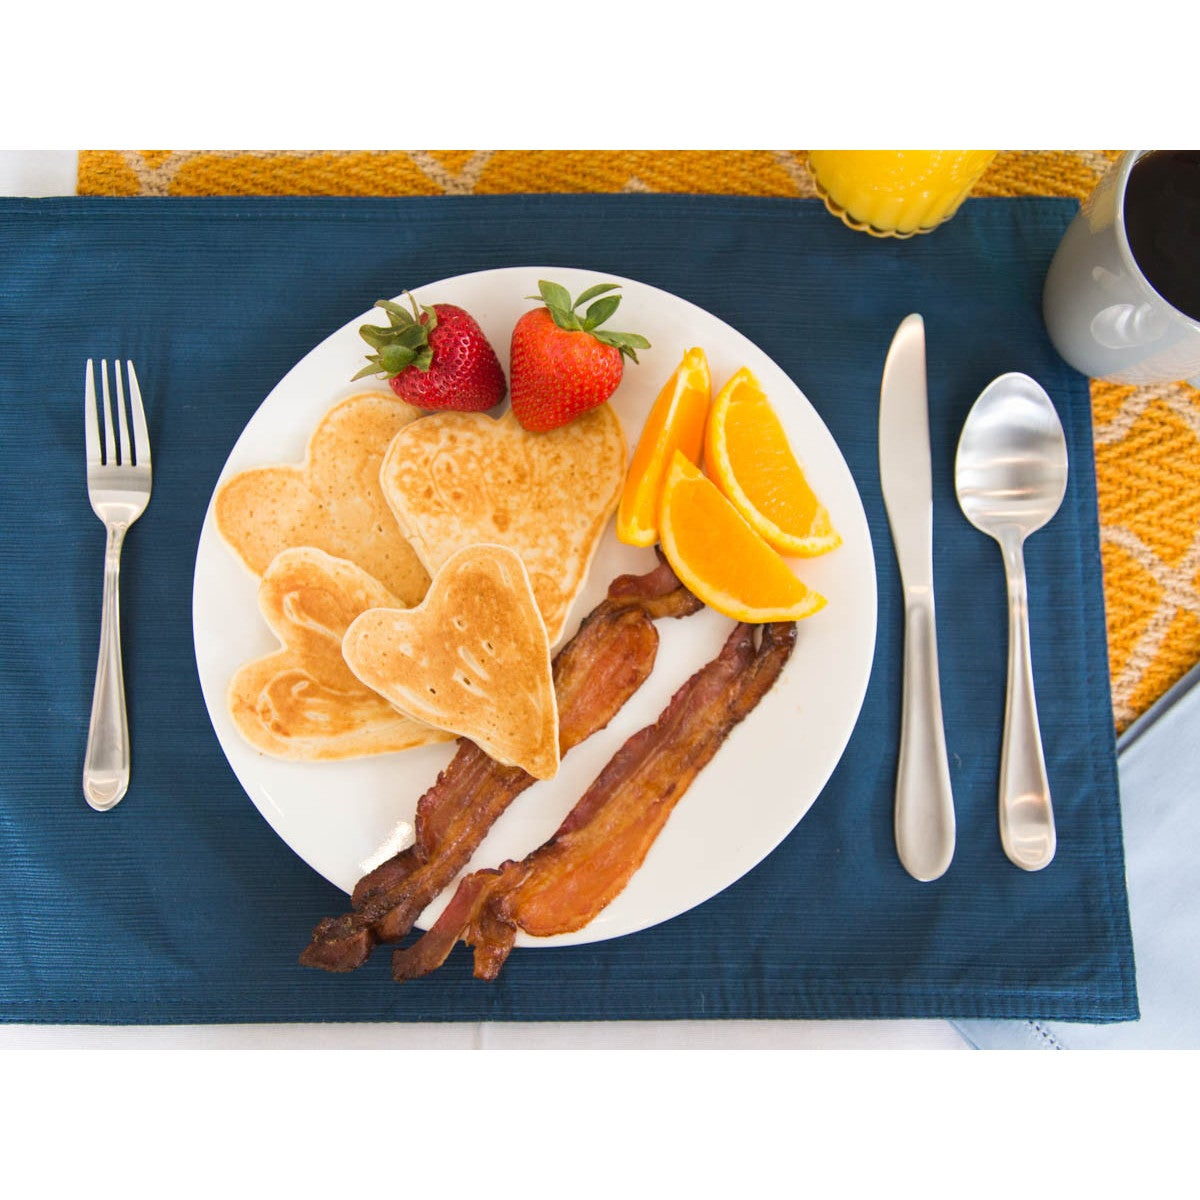 Corelle Livingware Winter Frost White Dinner Plate (Set of 6) - Free Shipping On Orders Over $45 - Overstock - 18637529  sc 1 st  Overstock.com & Corelle Livingware Winter Frost White Dinner Plate (Set of 6) - Free ...